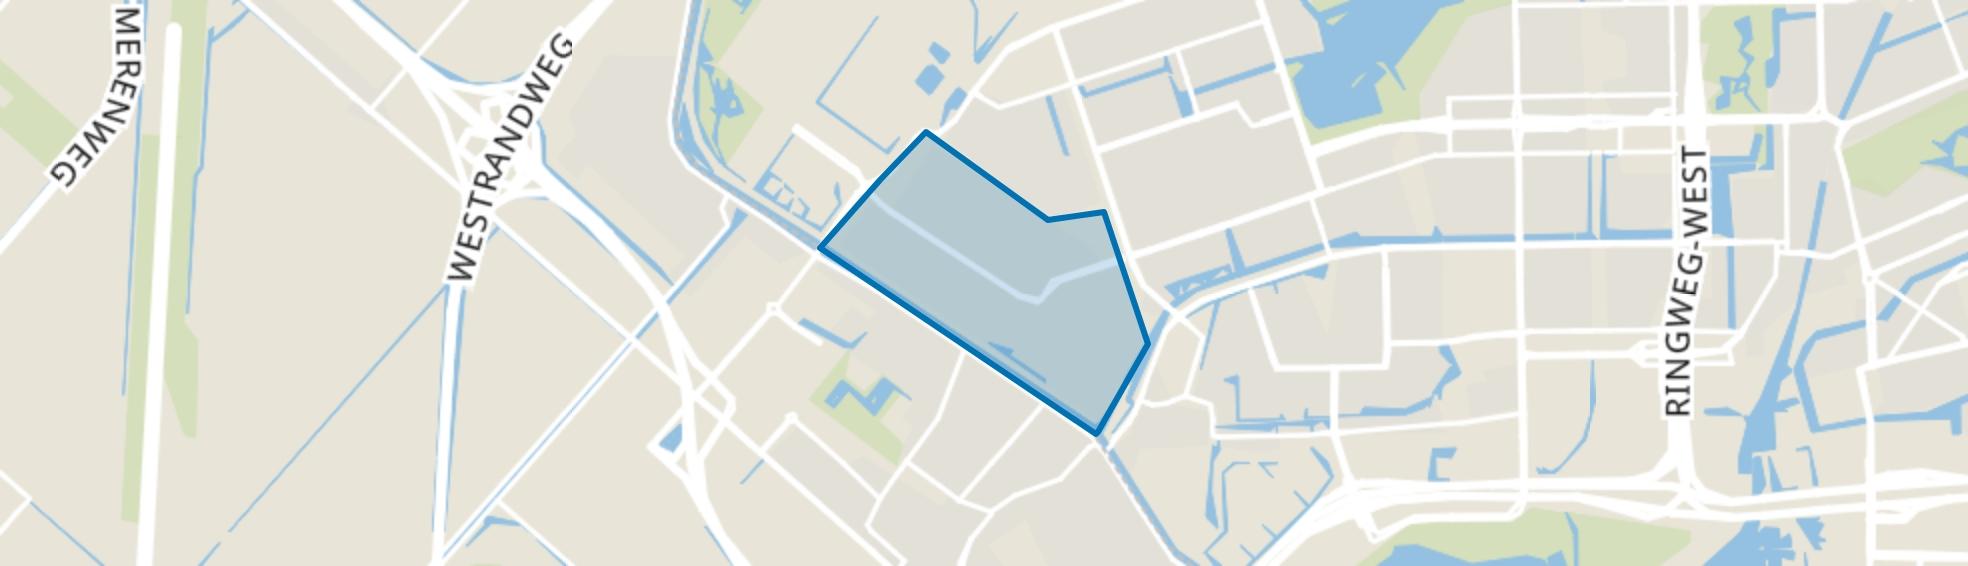 Middelveldsche Akerpolder, Amsterdam map